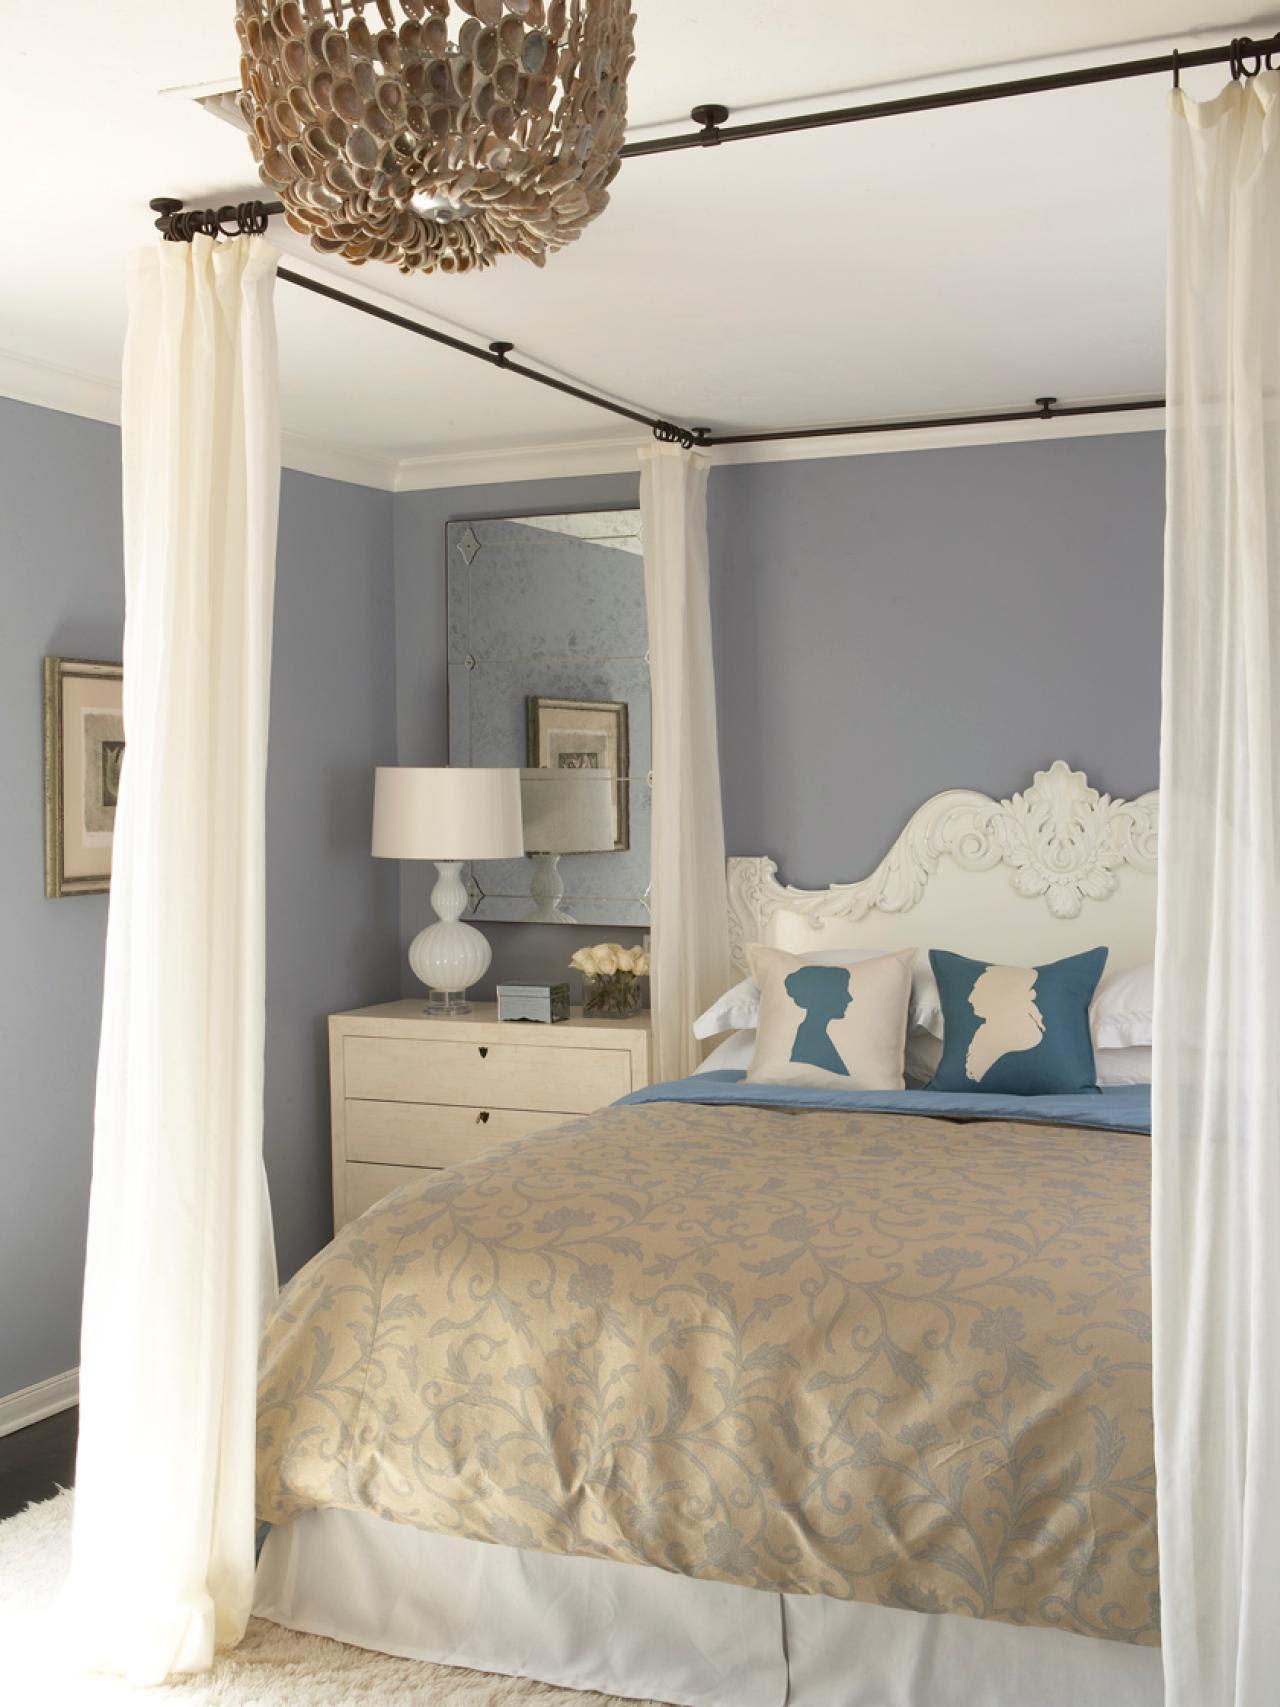 Canopy Bed Ideas | Bedrooms & Bedroom Decorating Ideas | HGTV